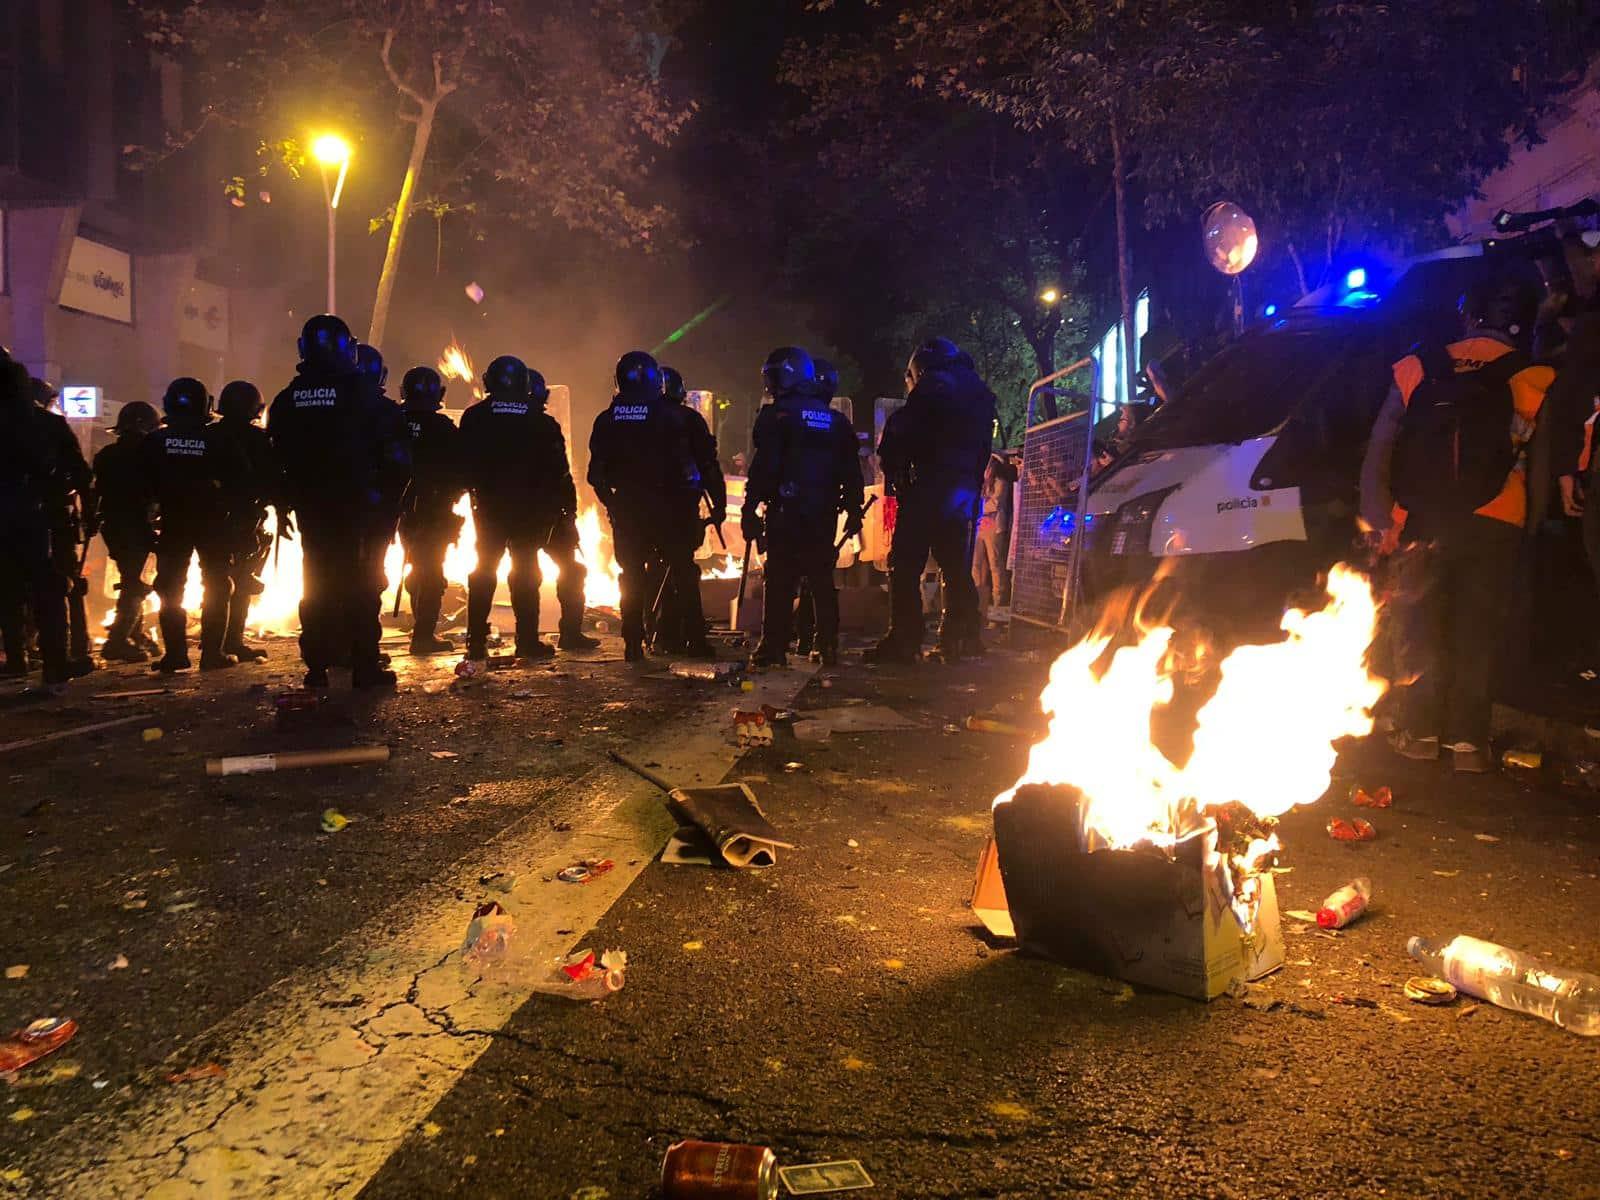 barcelone violence